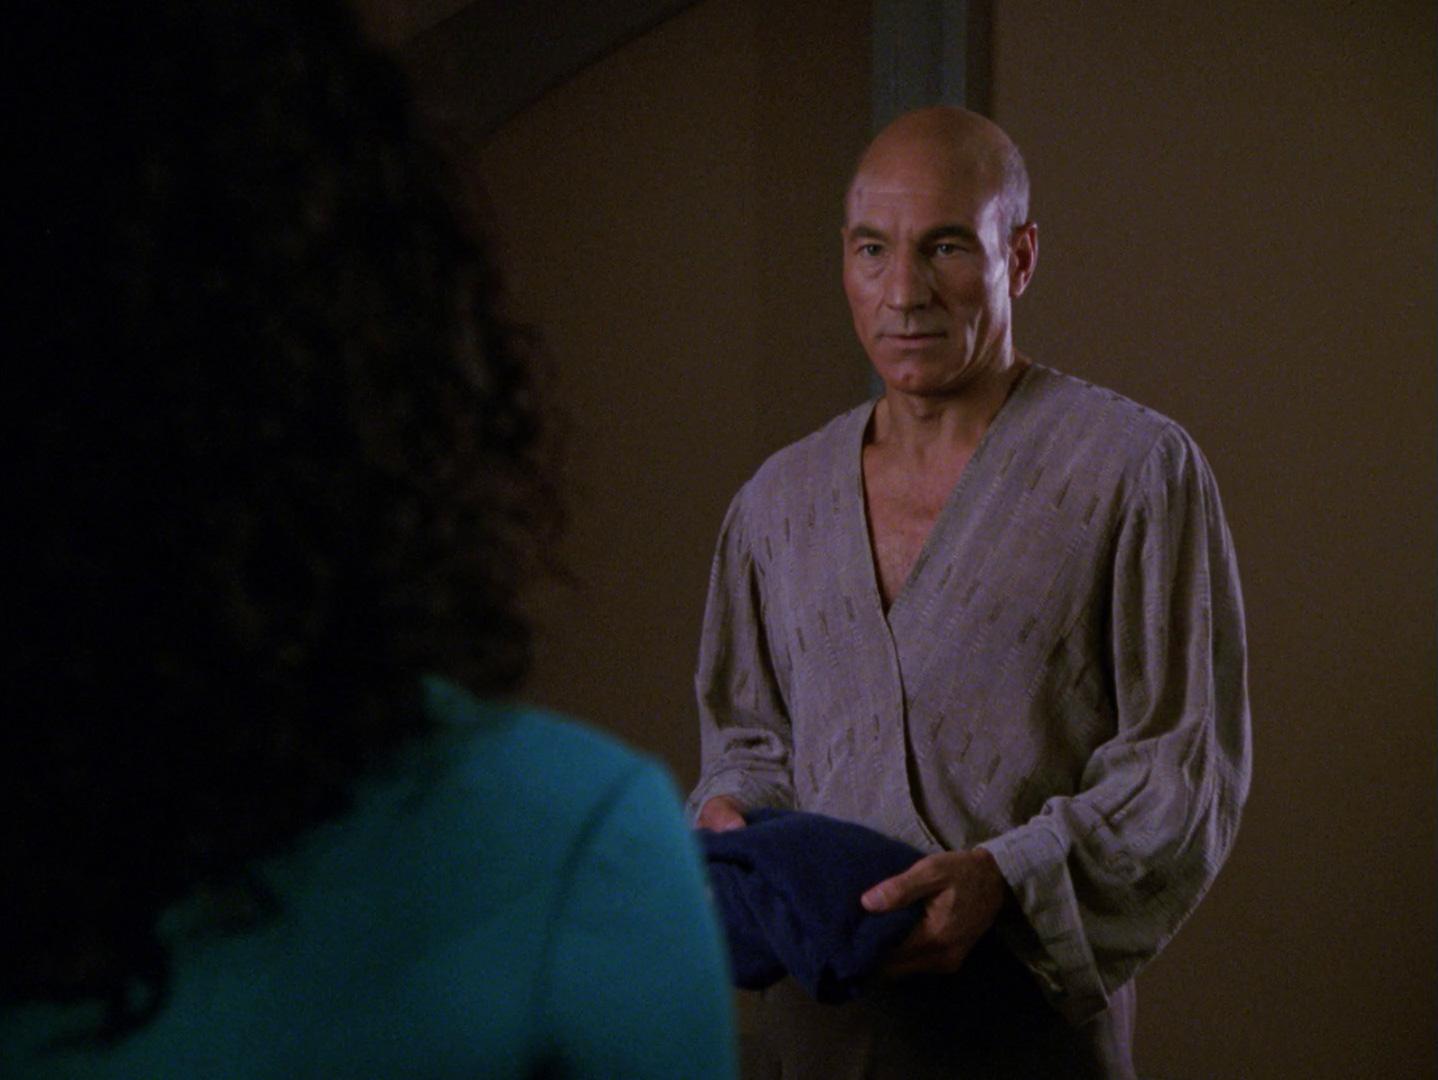 Blu-ray Review Star Trek: The Next Generation - Familienbegegnung (Family) Blu-ray Screencap © CBS/Paramount